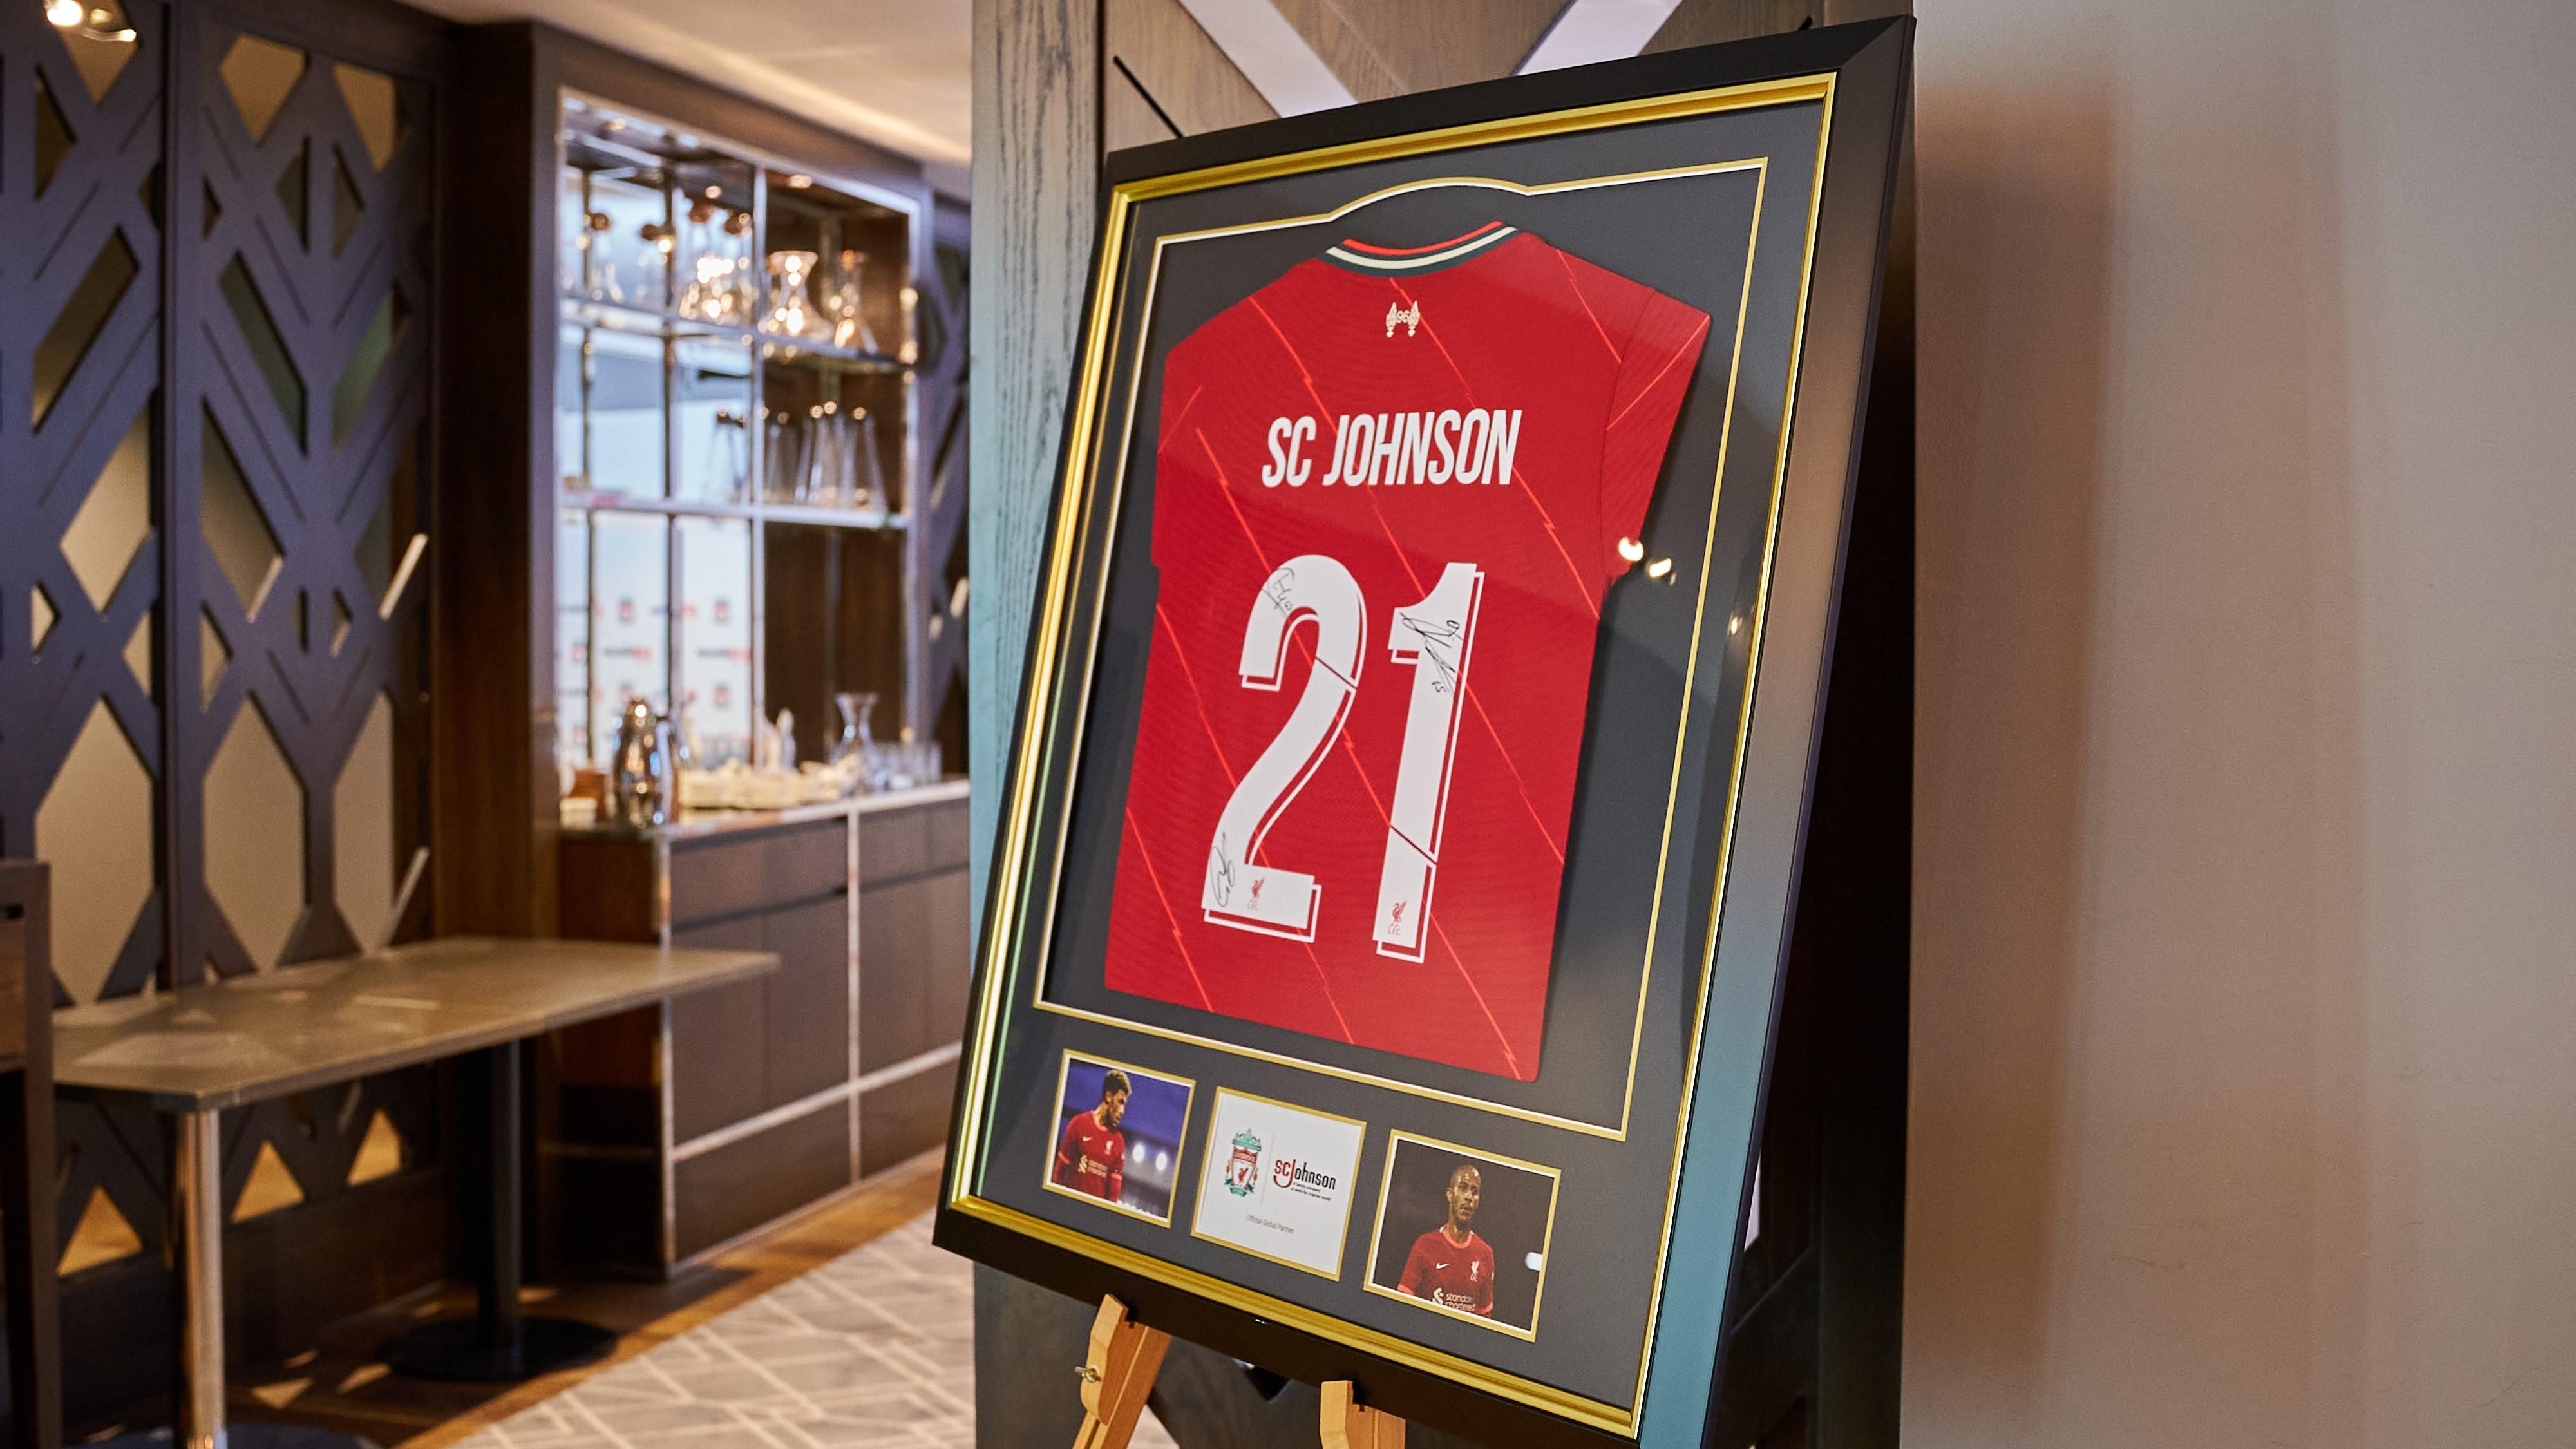 SC Johnson Liverpool Jersey Displayed